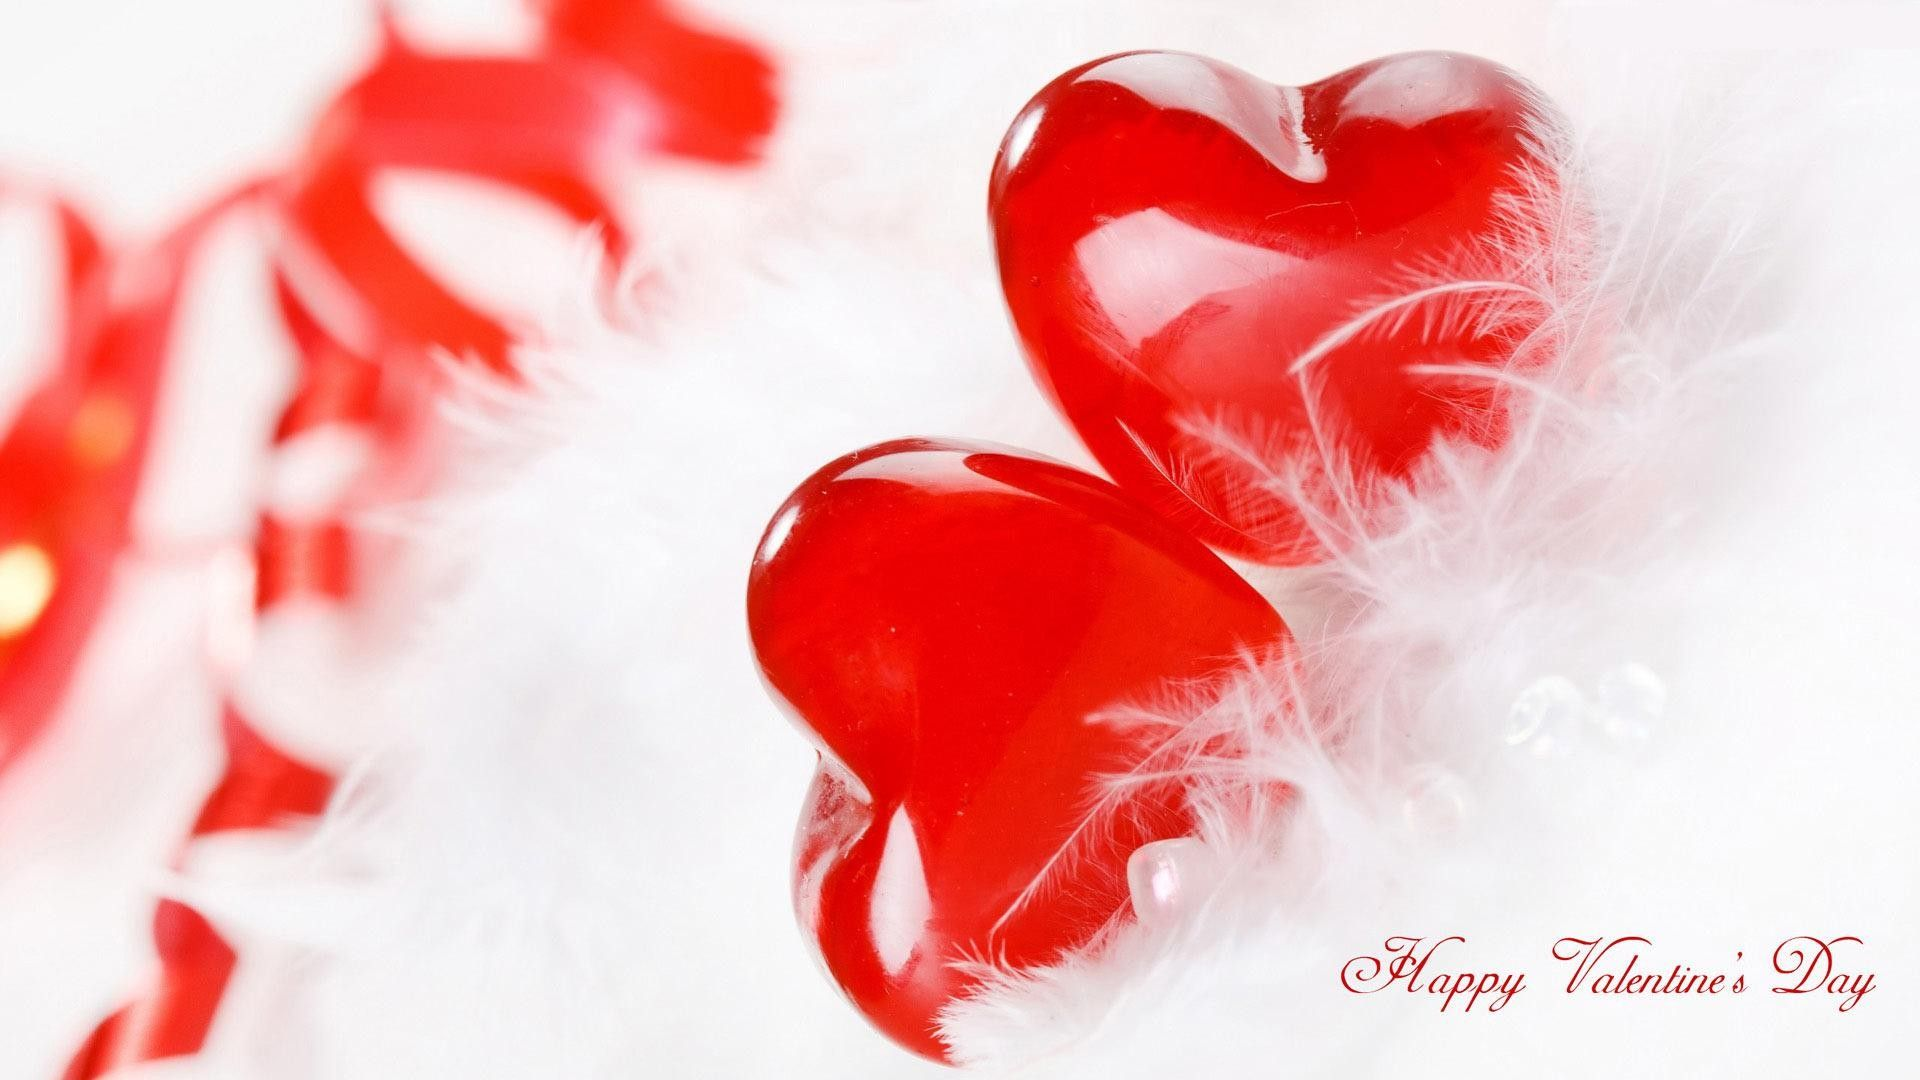 Valentines Wallpaper 2021 Live Wallpaper Hd Heart Wallpaper Heart Wallpaper Hd Love Wallpaper Download Cute heart love wallpaper hd download